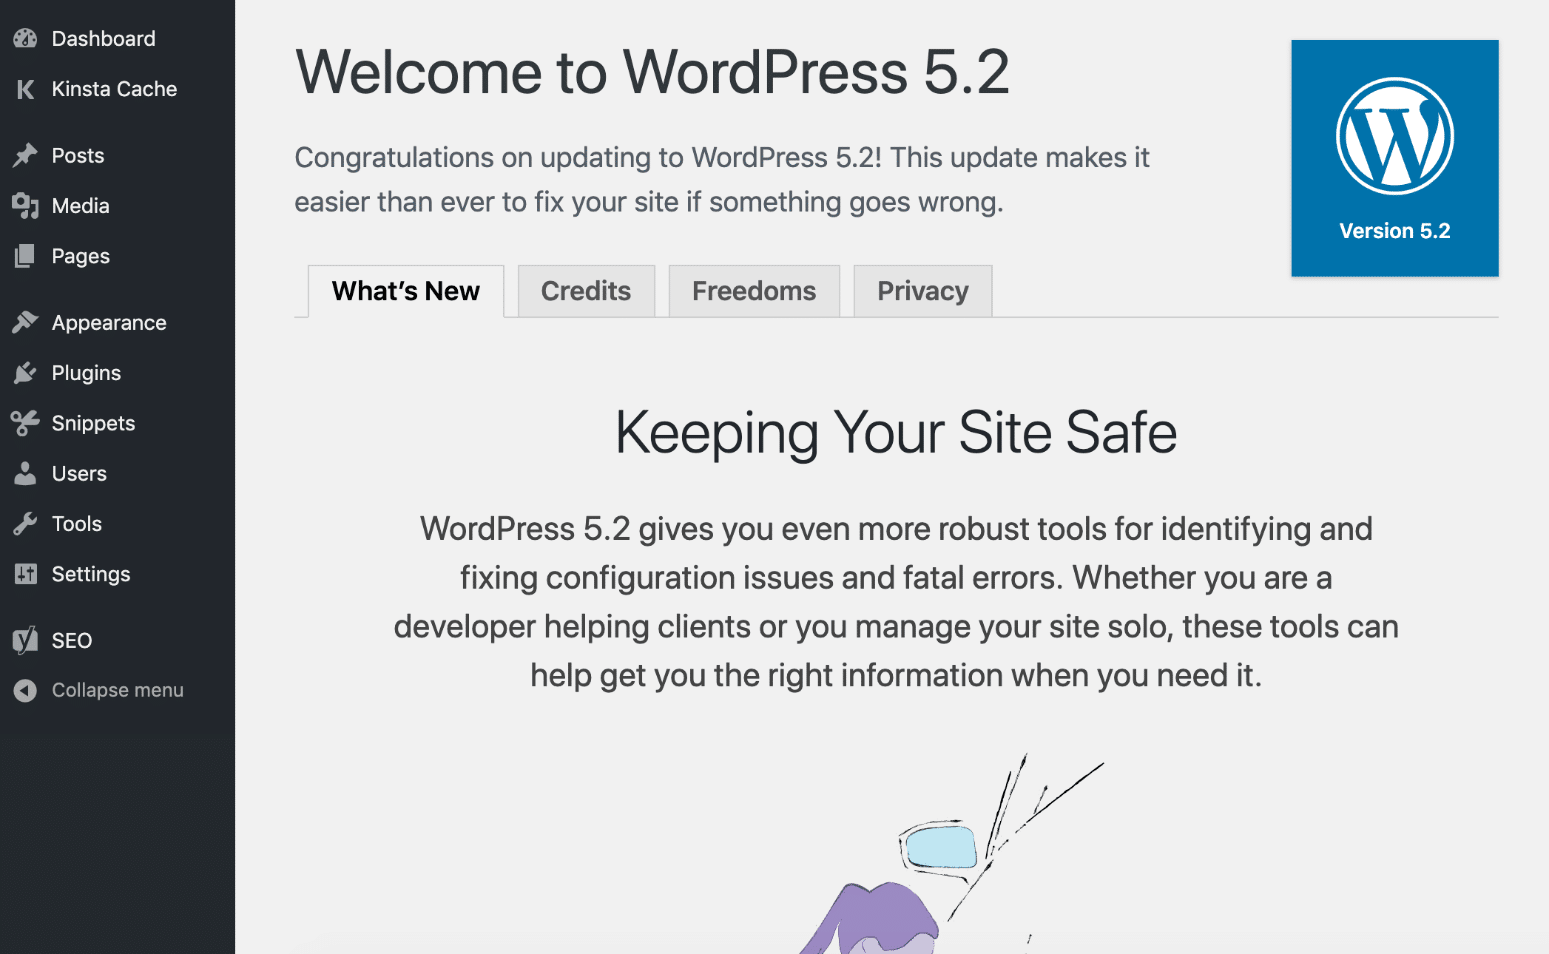 WordPress 5.2 welcome screen